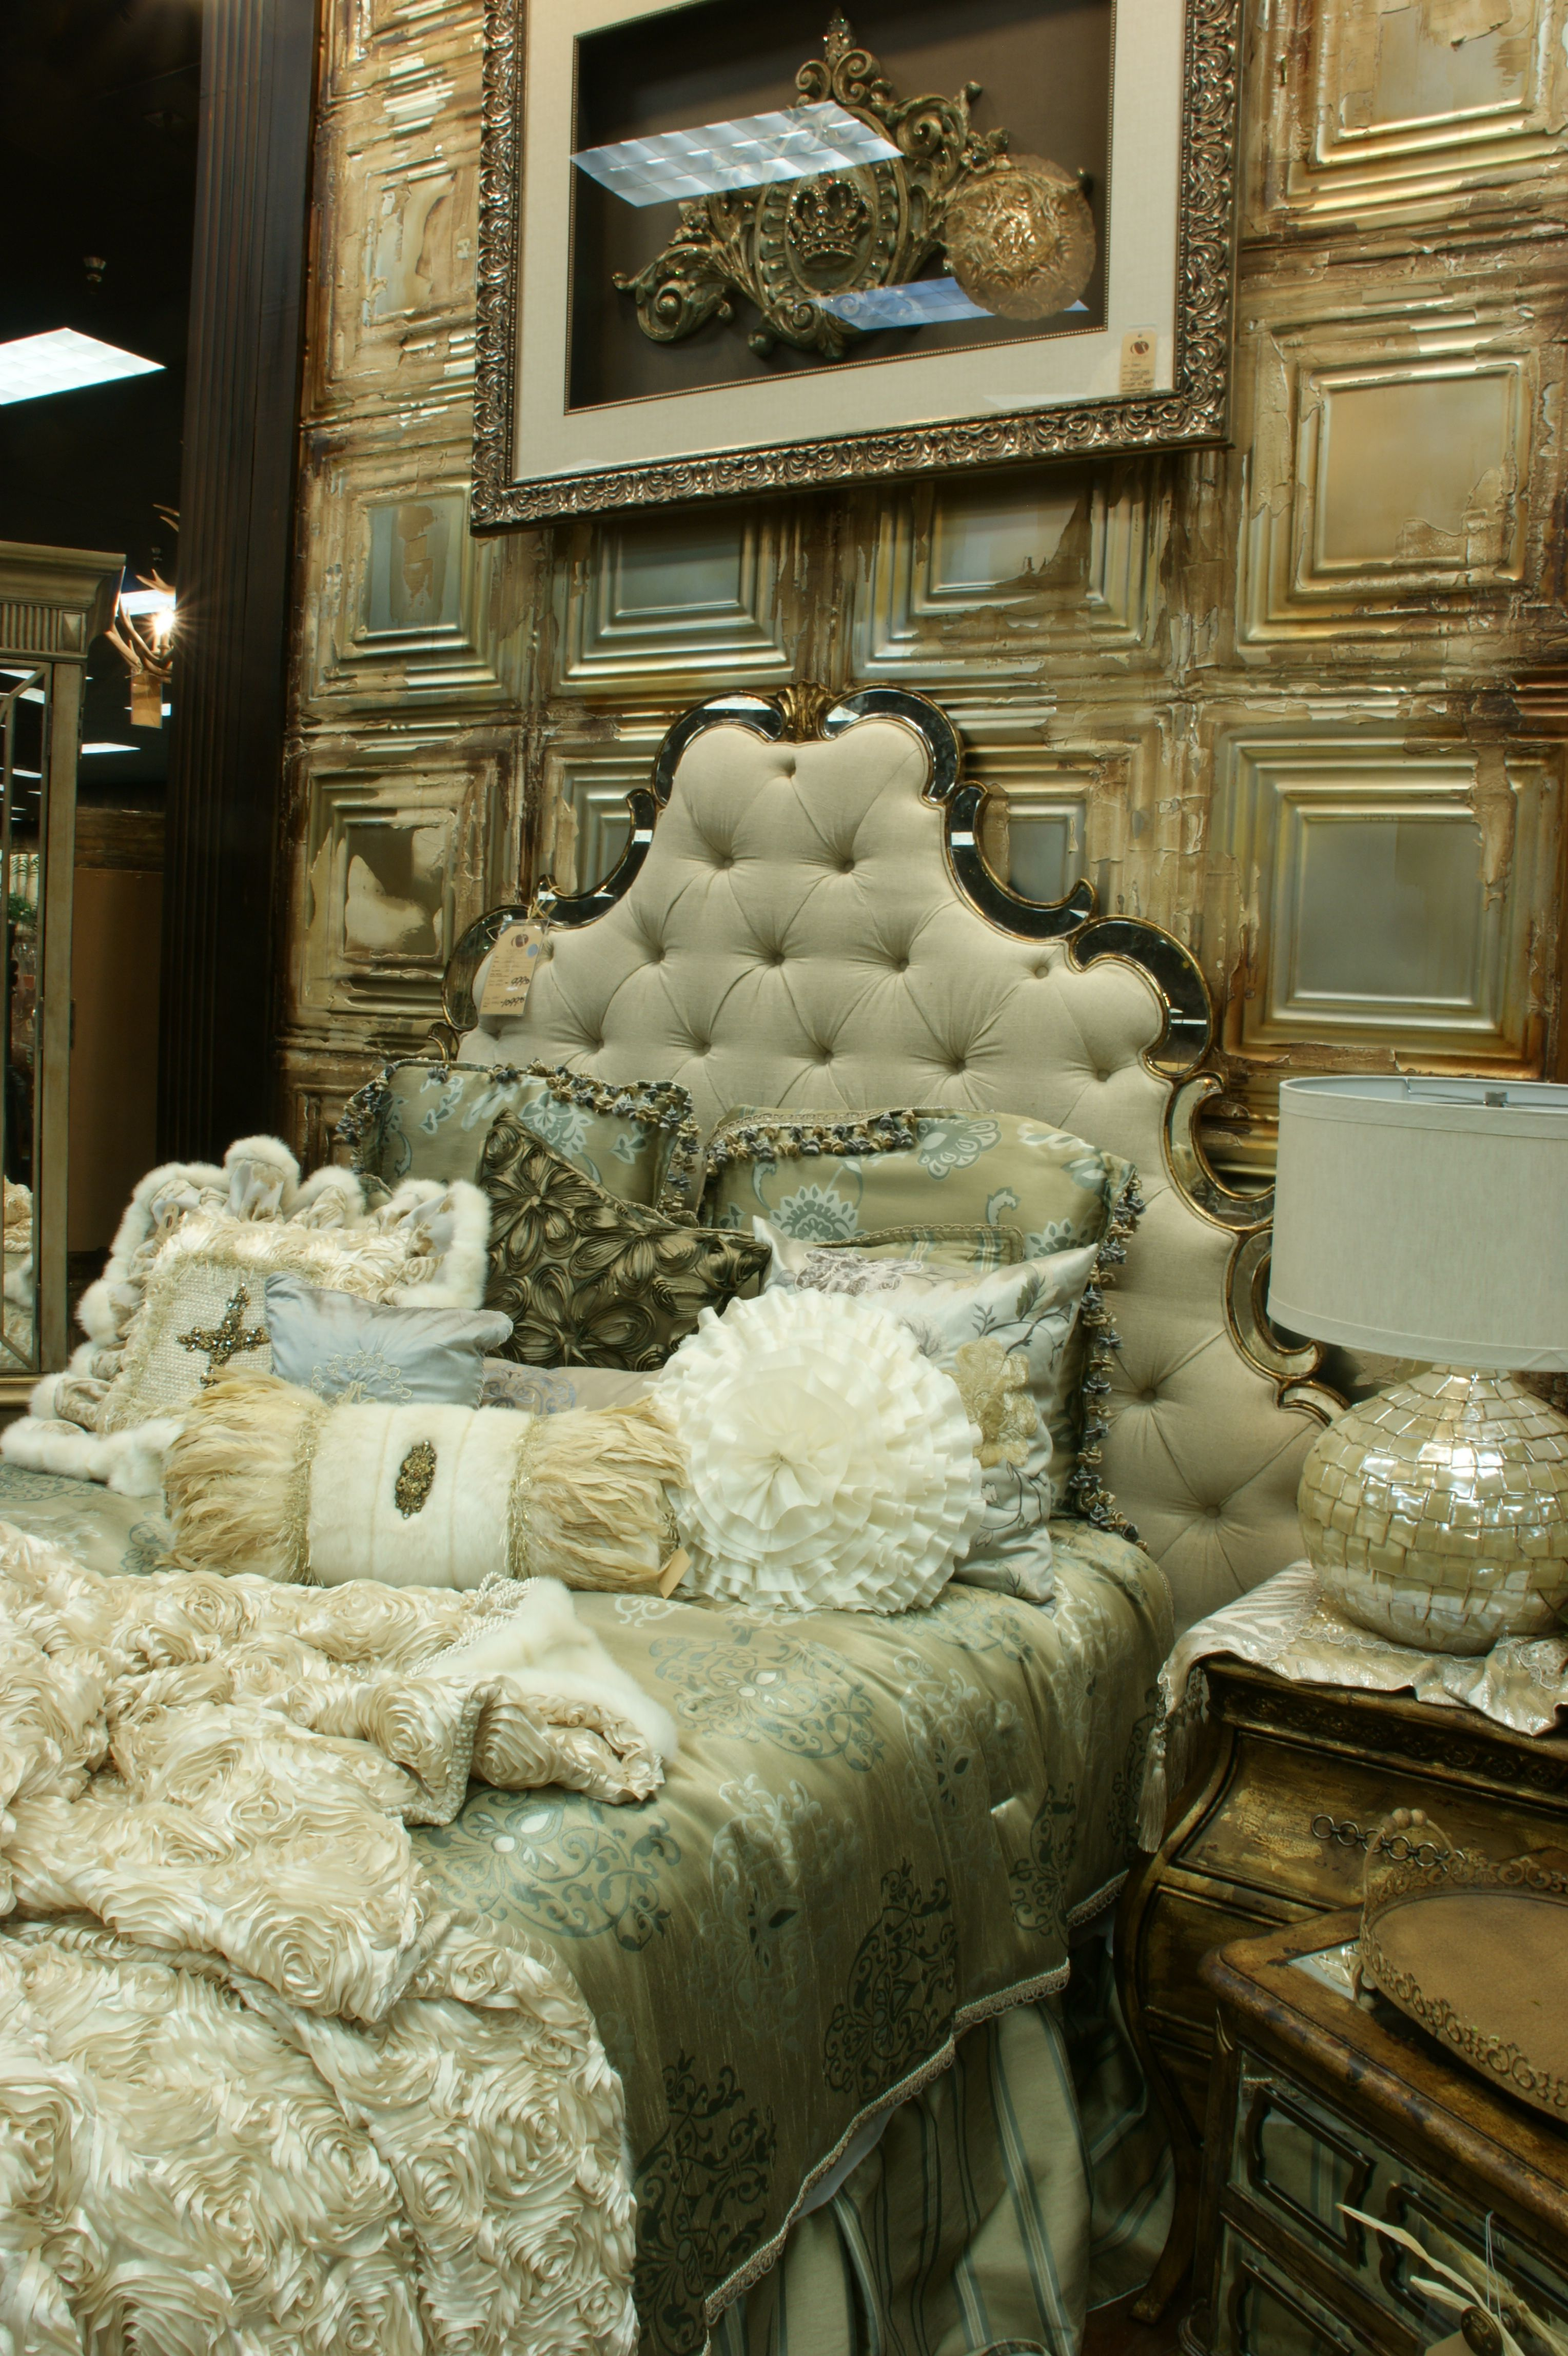 Available At Carteru0027s Furniture, Midland, Texas 432 682 2843  Http://www.cartersfurnituremidland.com/